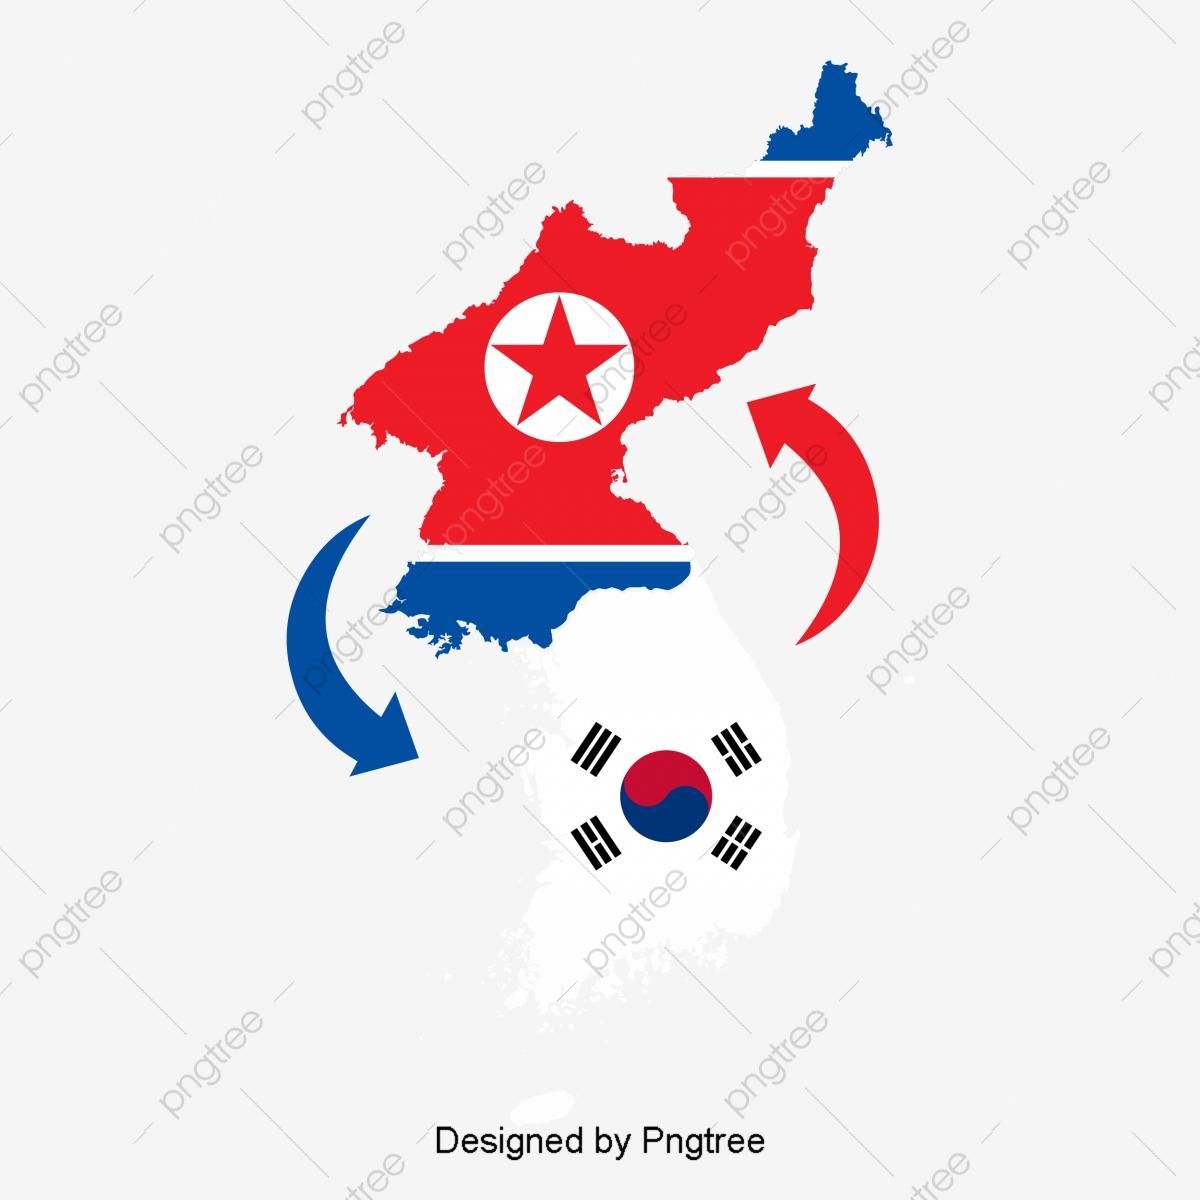 North Korea South Korea Cooperation Of Each Traffic Class.